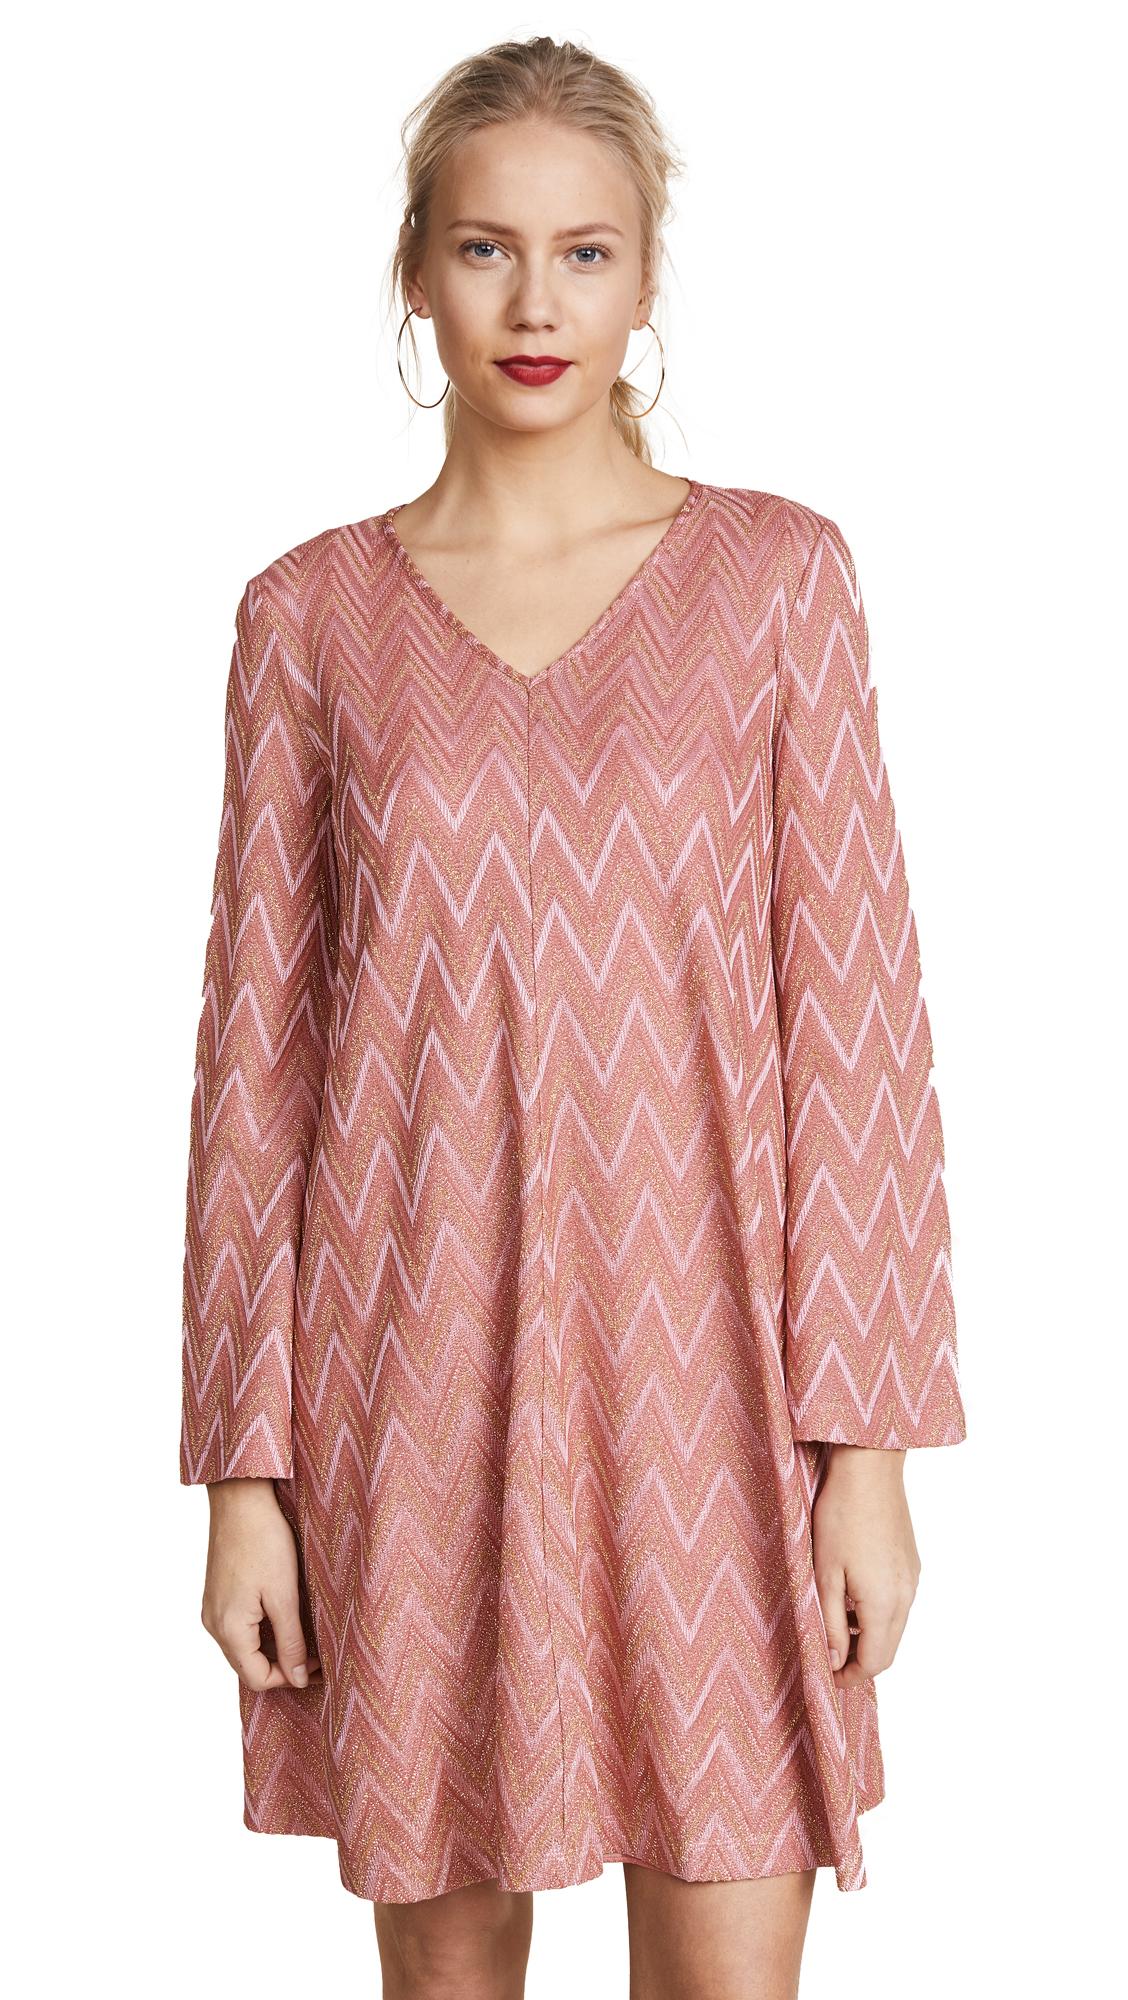 M Missoni Flare Sleeve Mini Dress